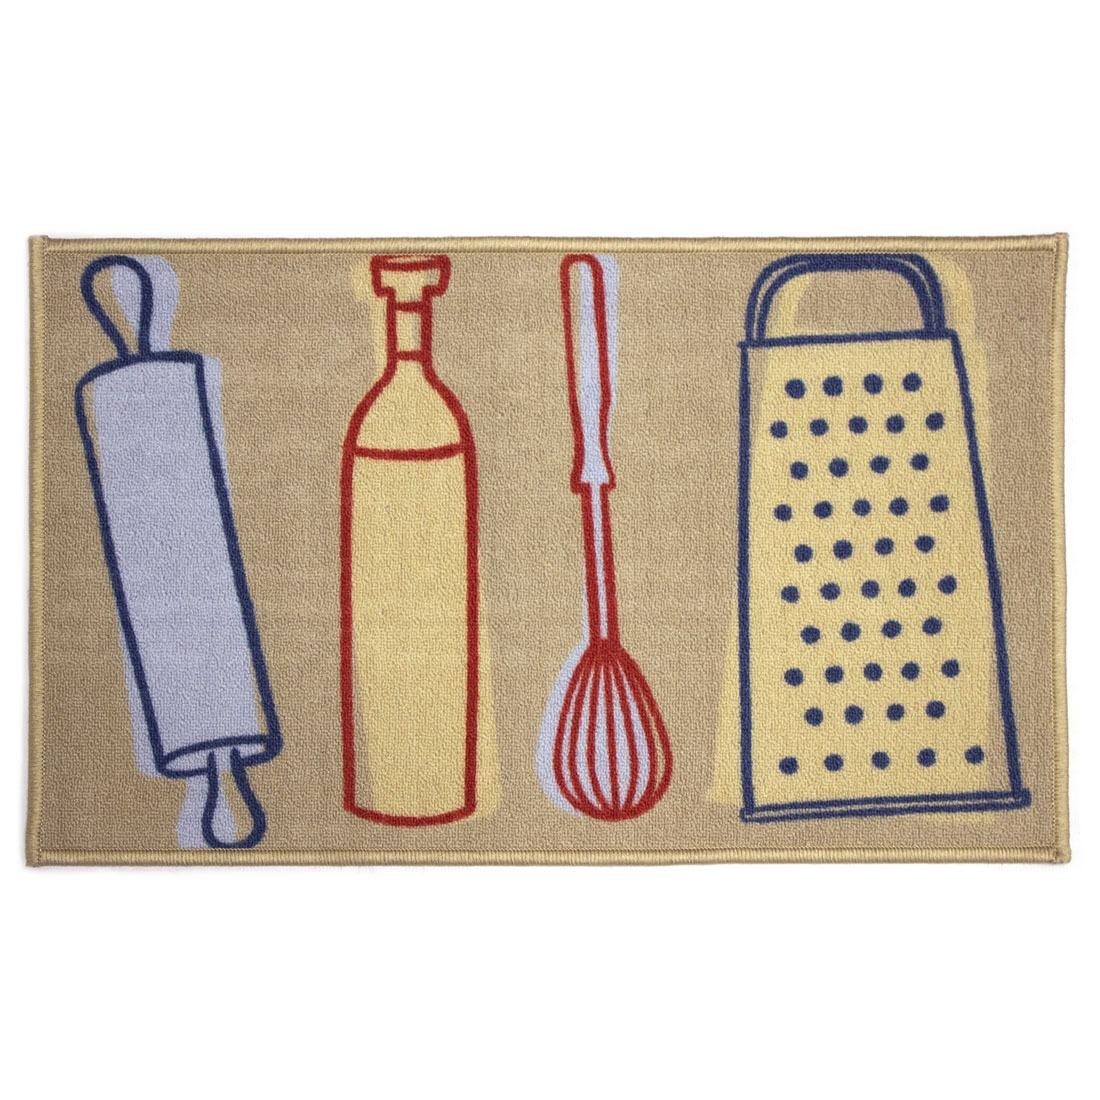 Tapete Cozinha Gourmet Utens Lios 0 50m X 0 80m Kapazi R 46 90